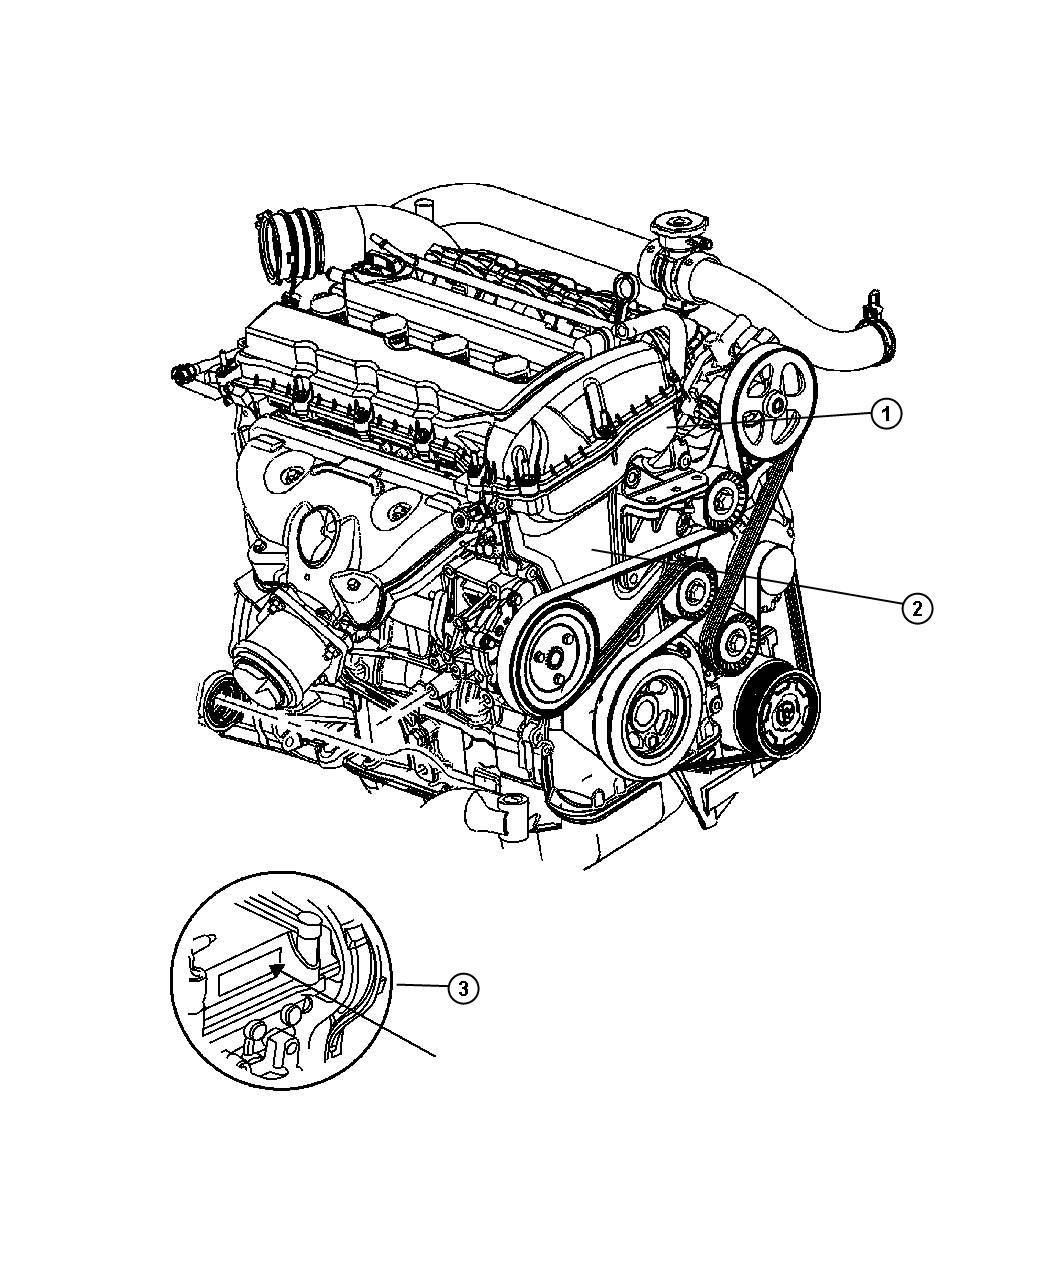 2008 Dodge Caliber Engine. Long block. Turbo